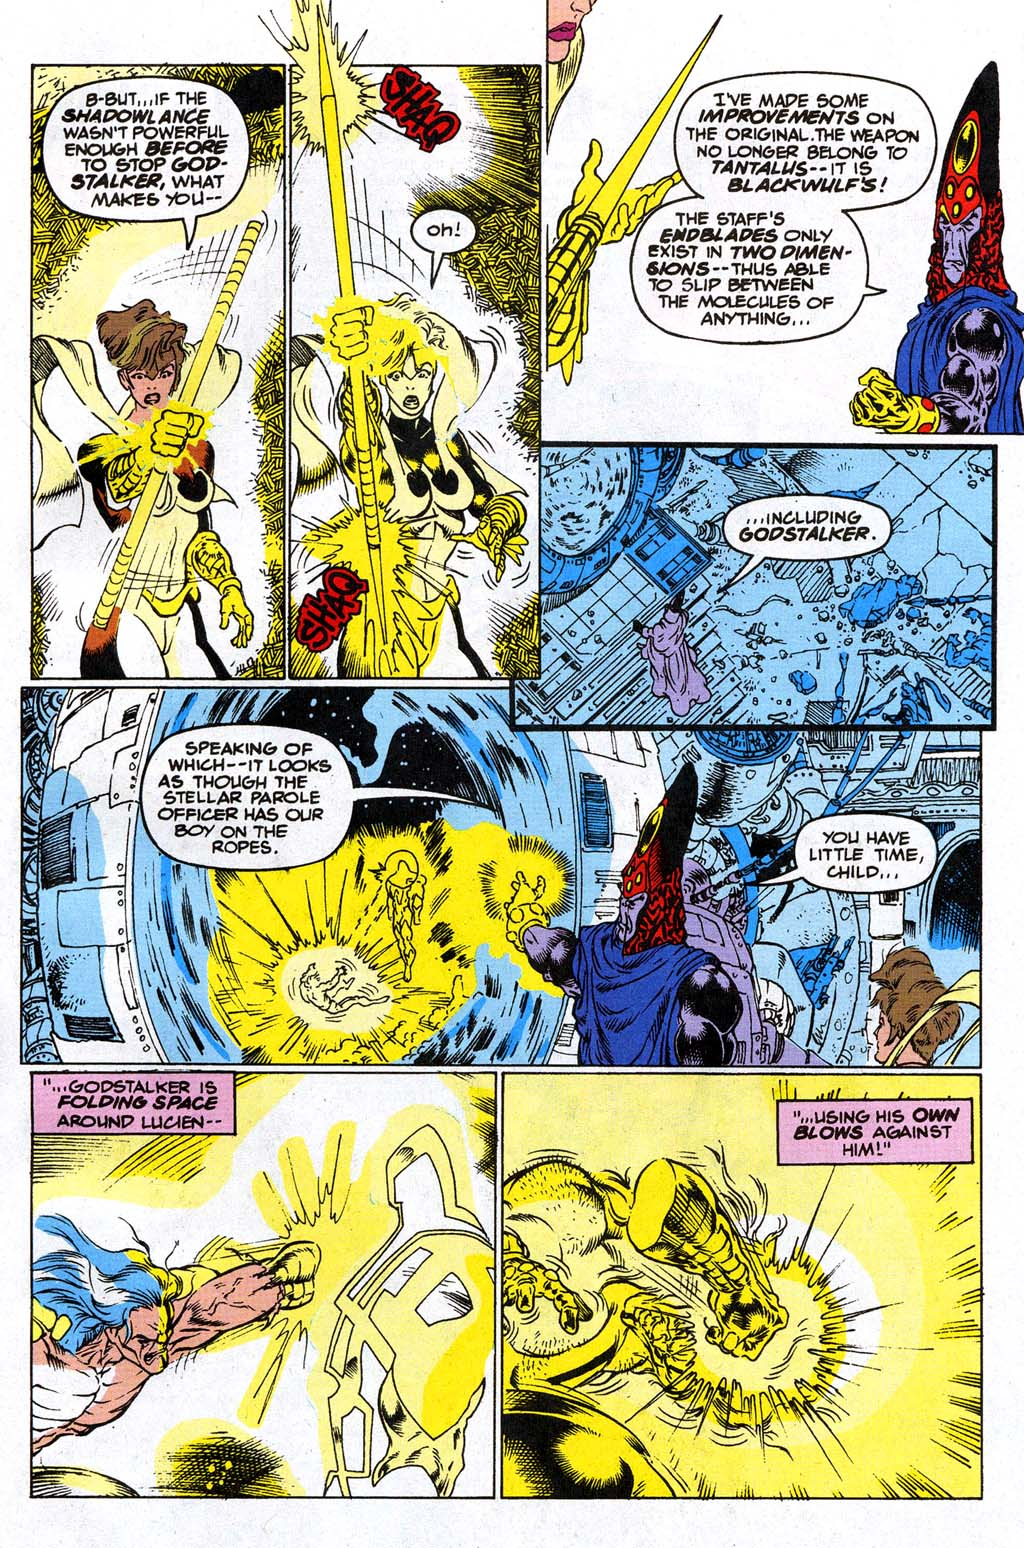 Read online Blackwulf comic -  Issue #9 - 17